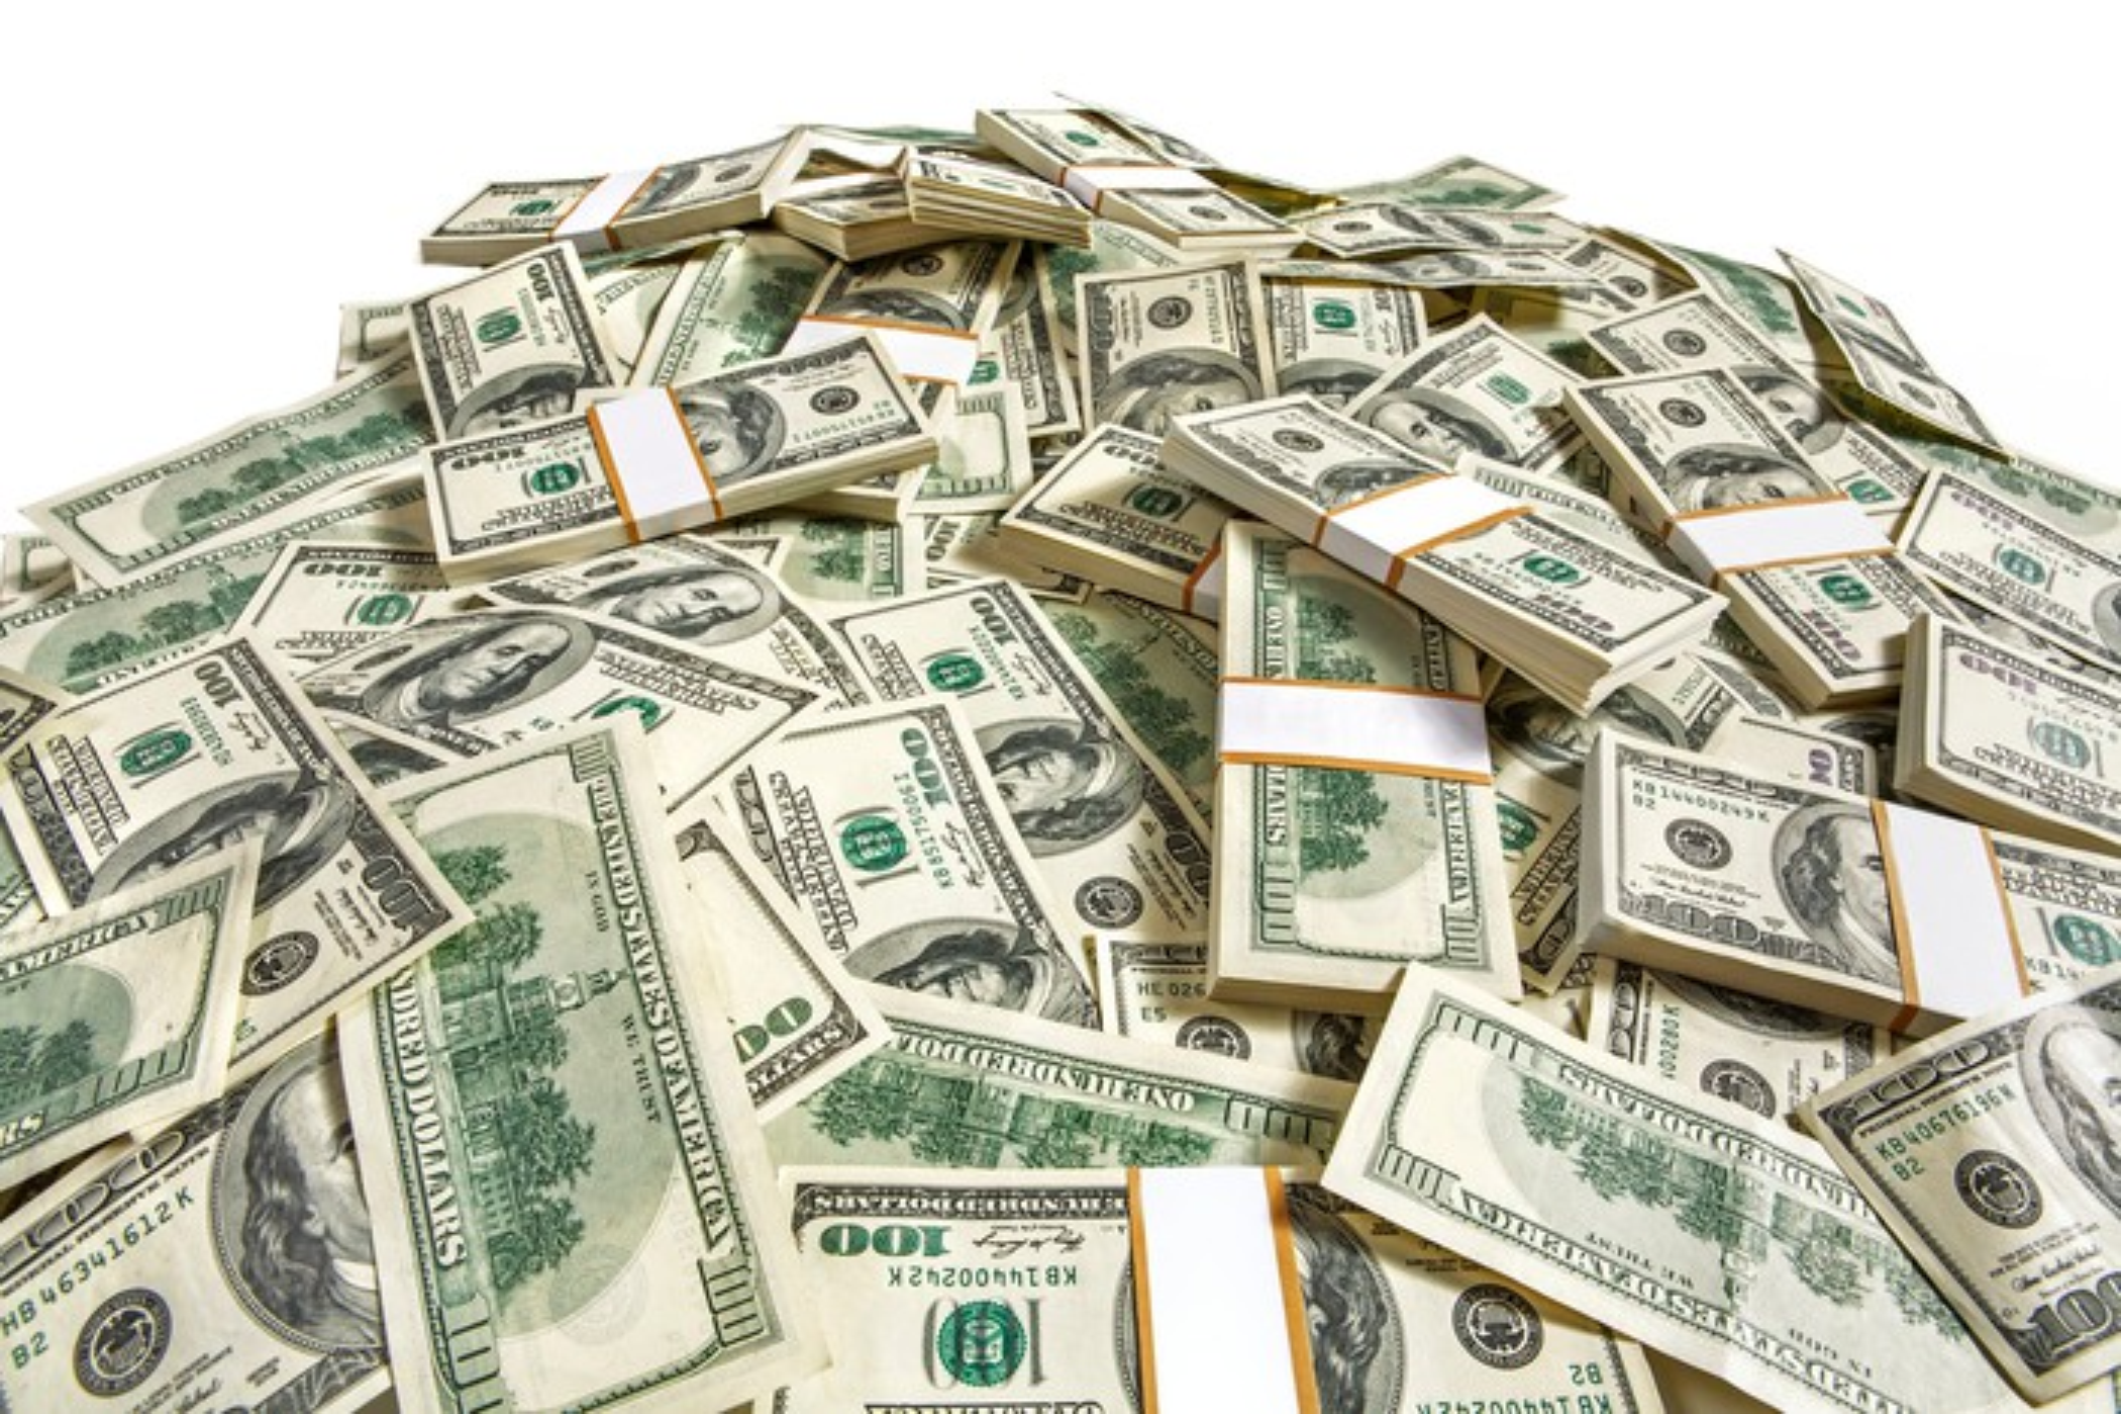 Pile of cash, bundles of 100 dollar bills.